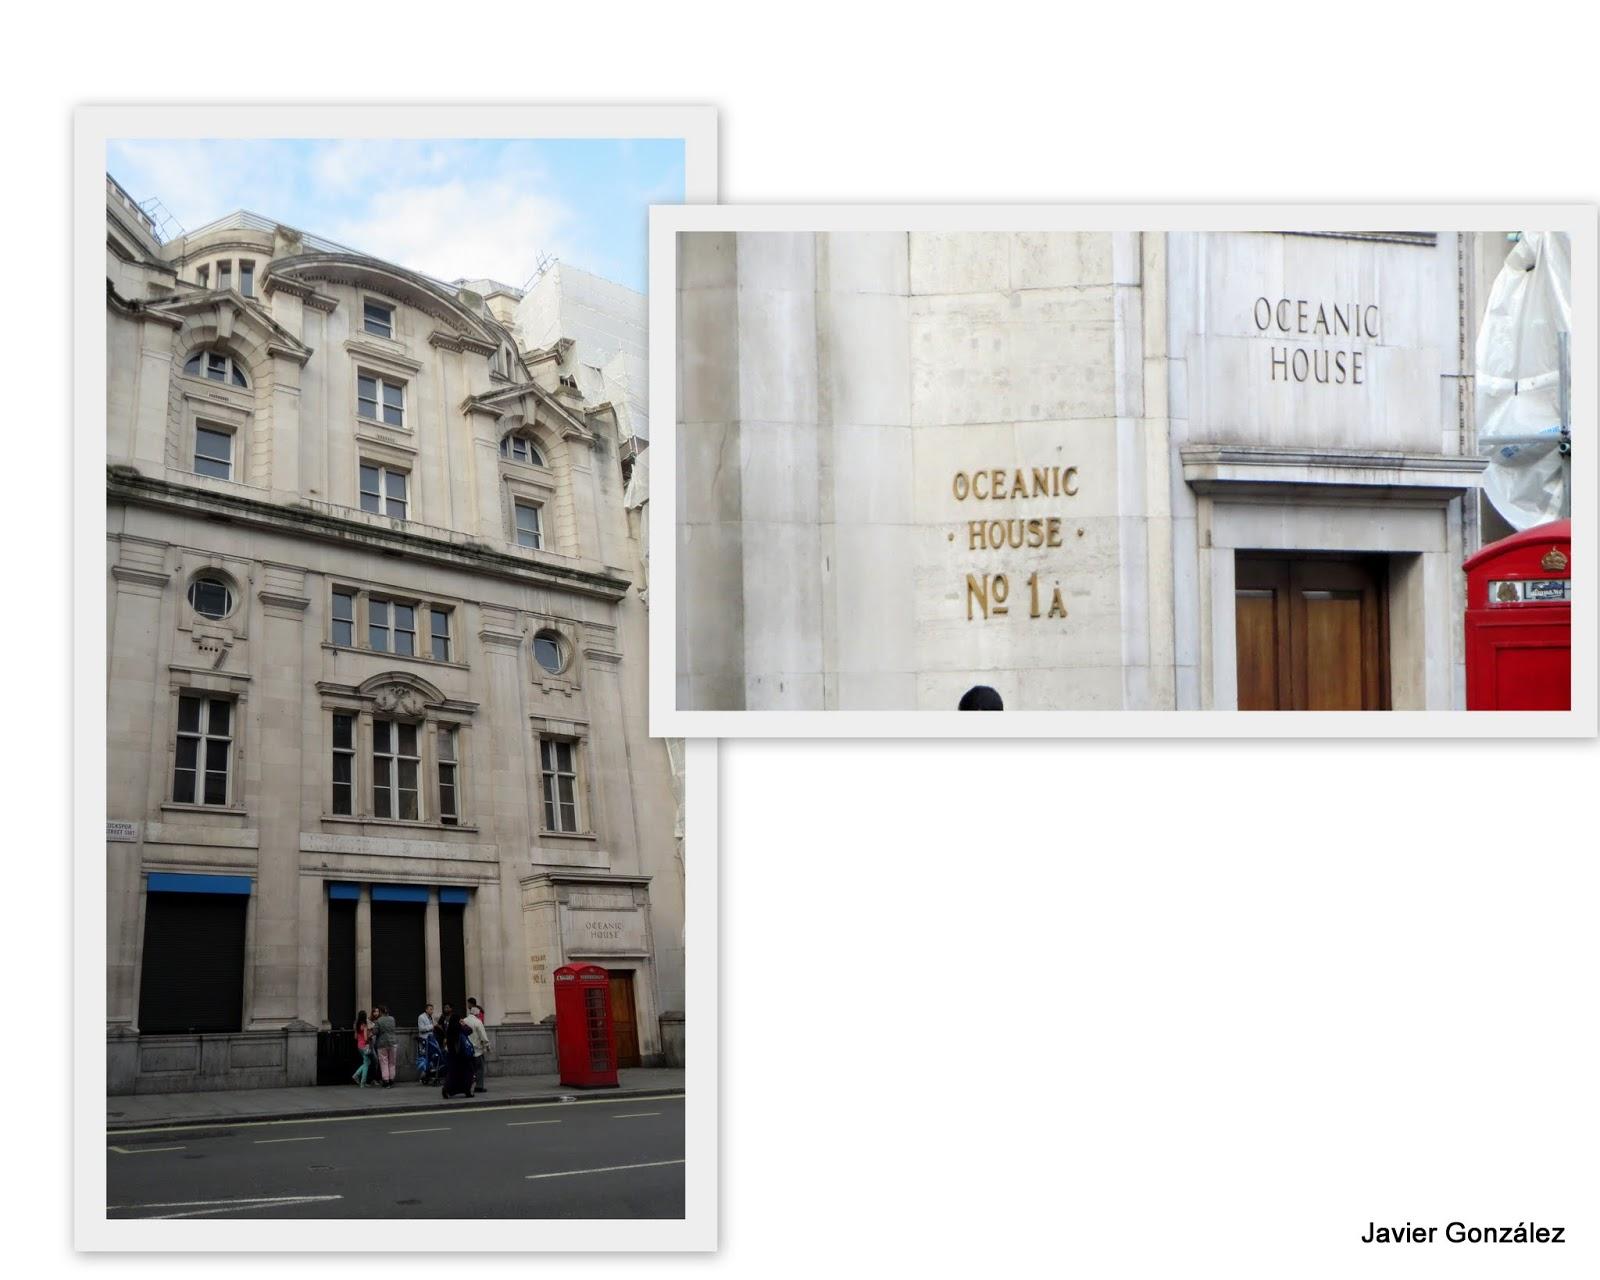 Londres. OFICINAS DEL TITANIC